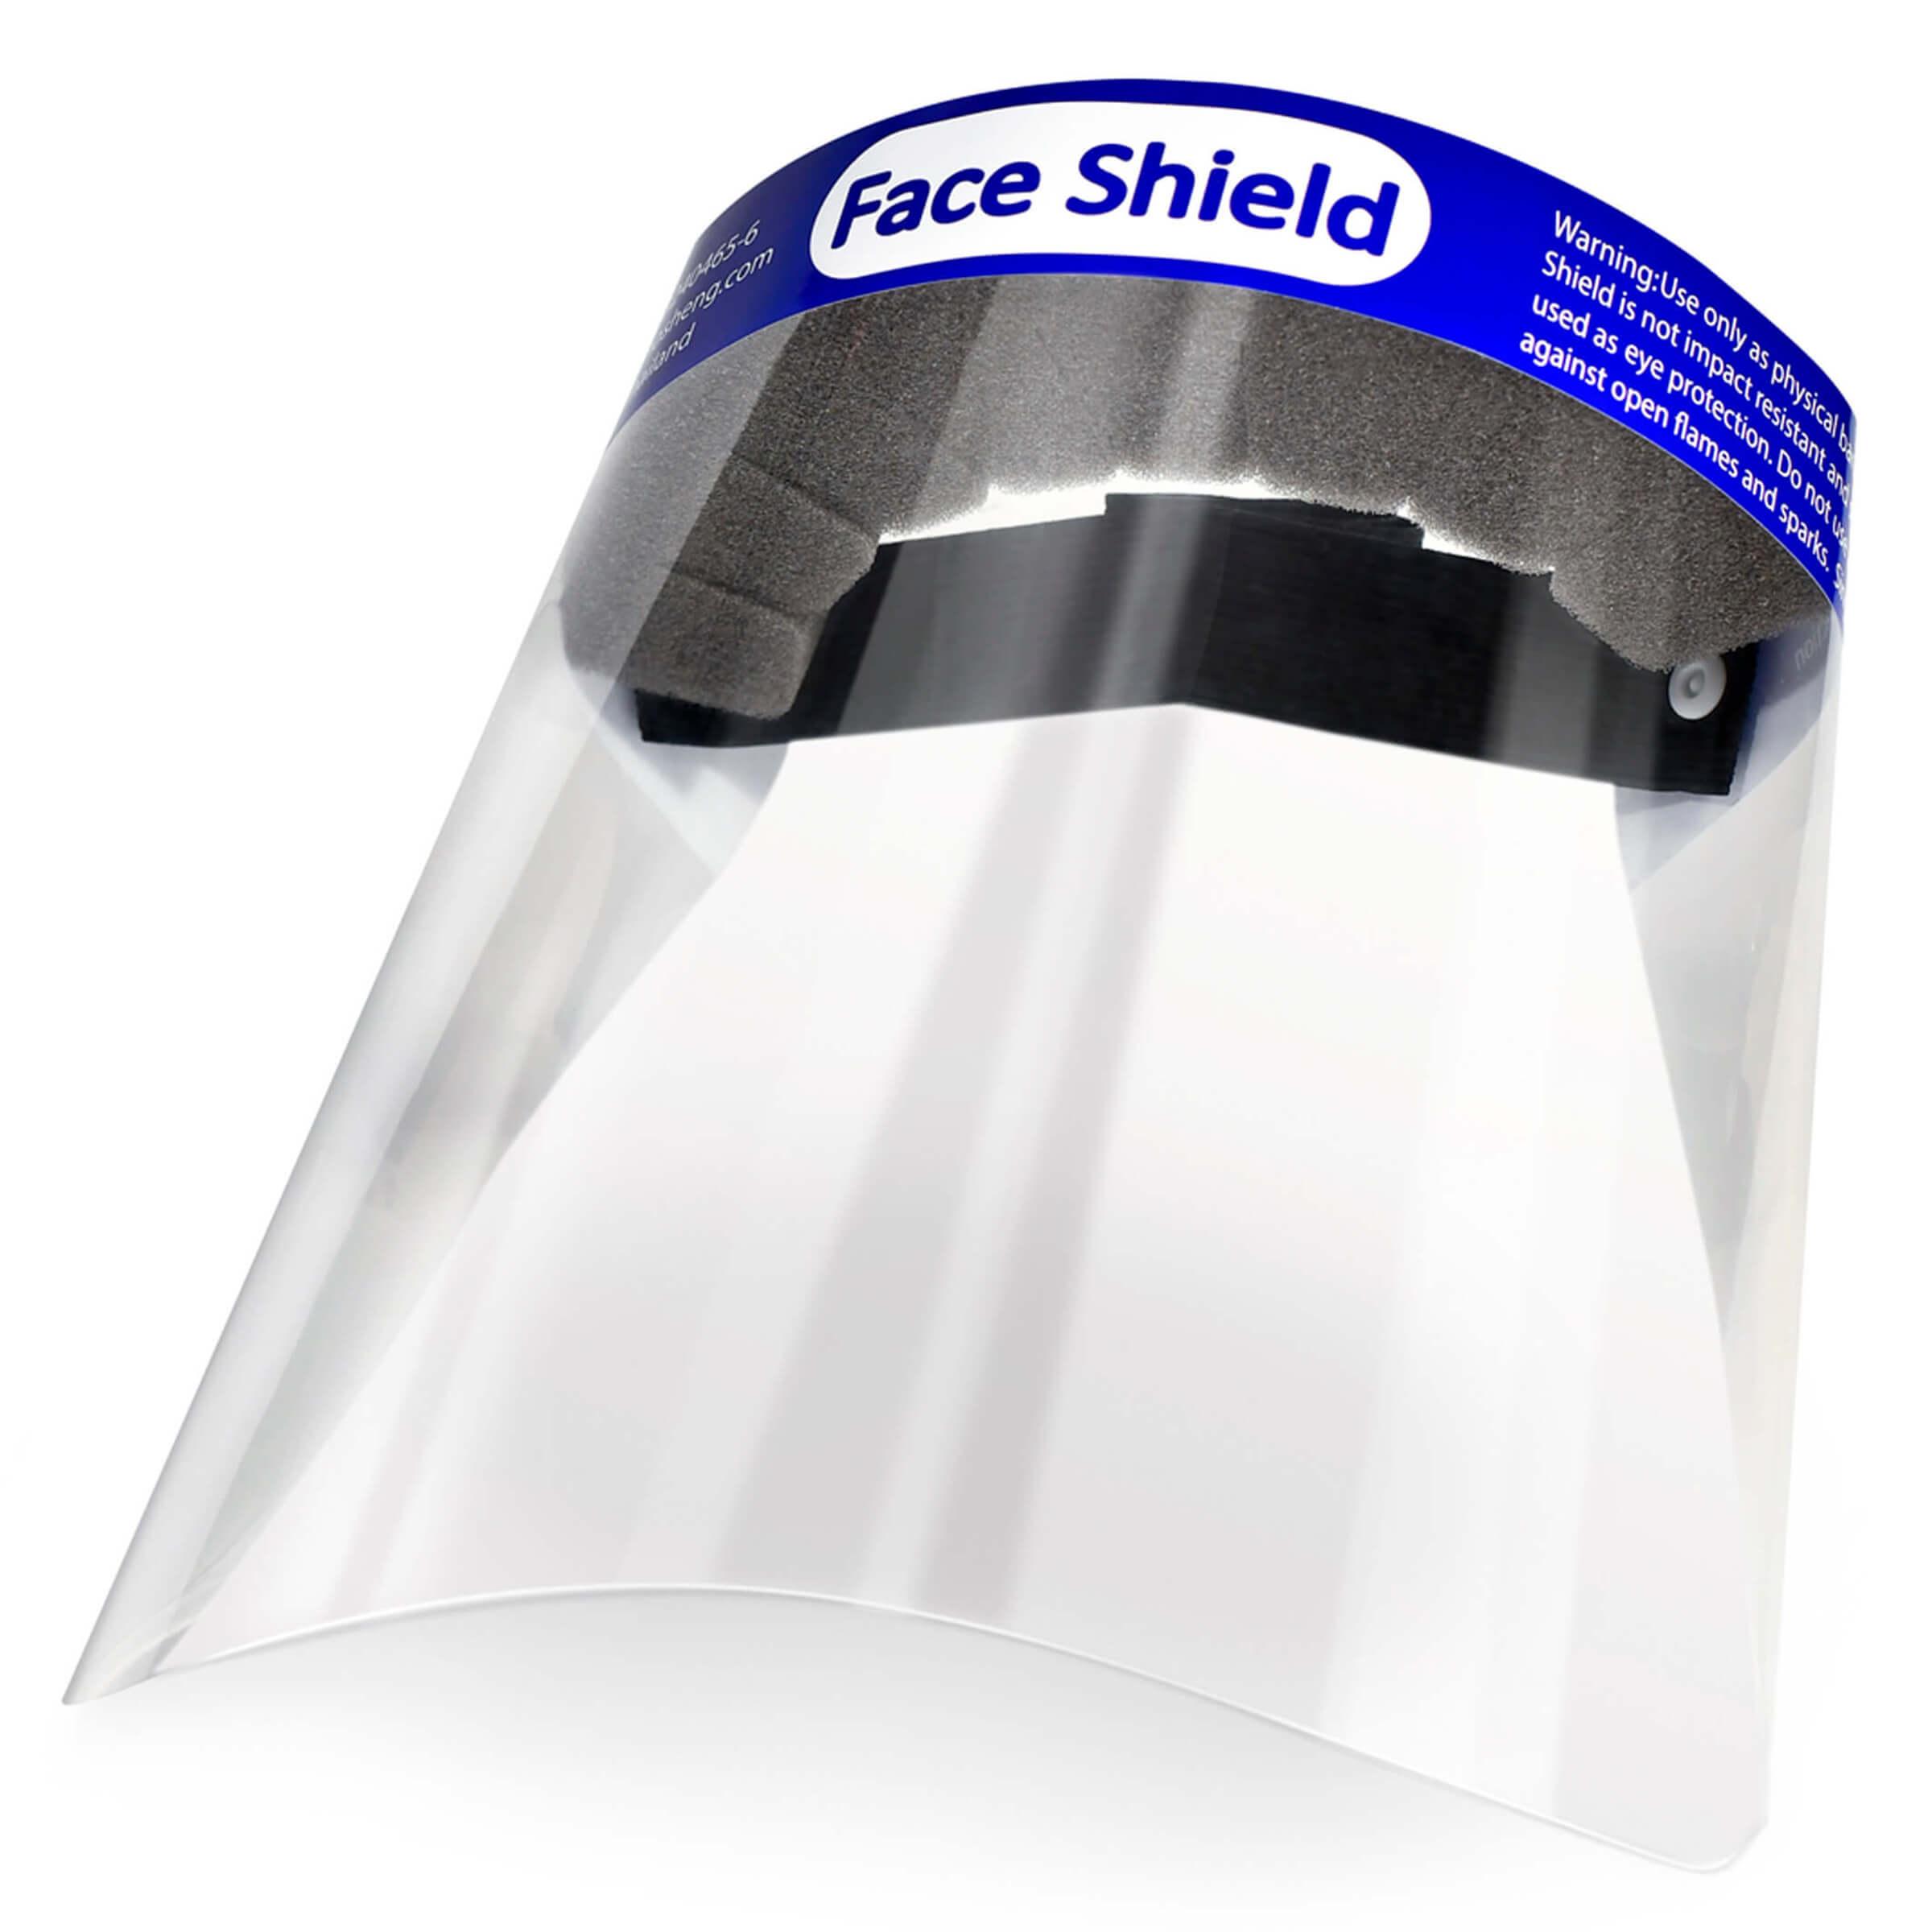 PC-FS10-a-ppe-salon-face-shield-l.jpg